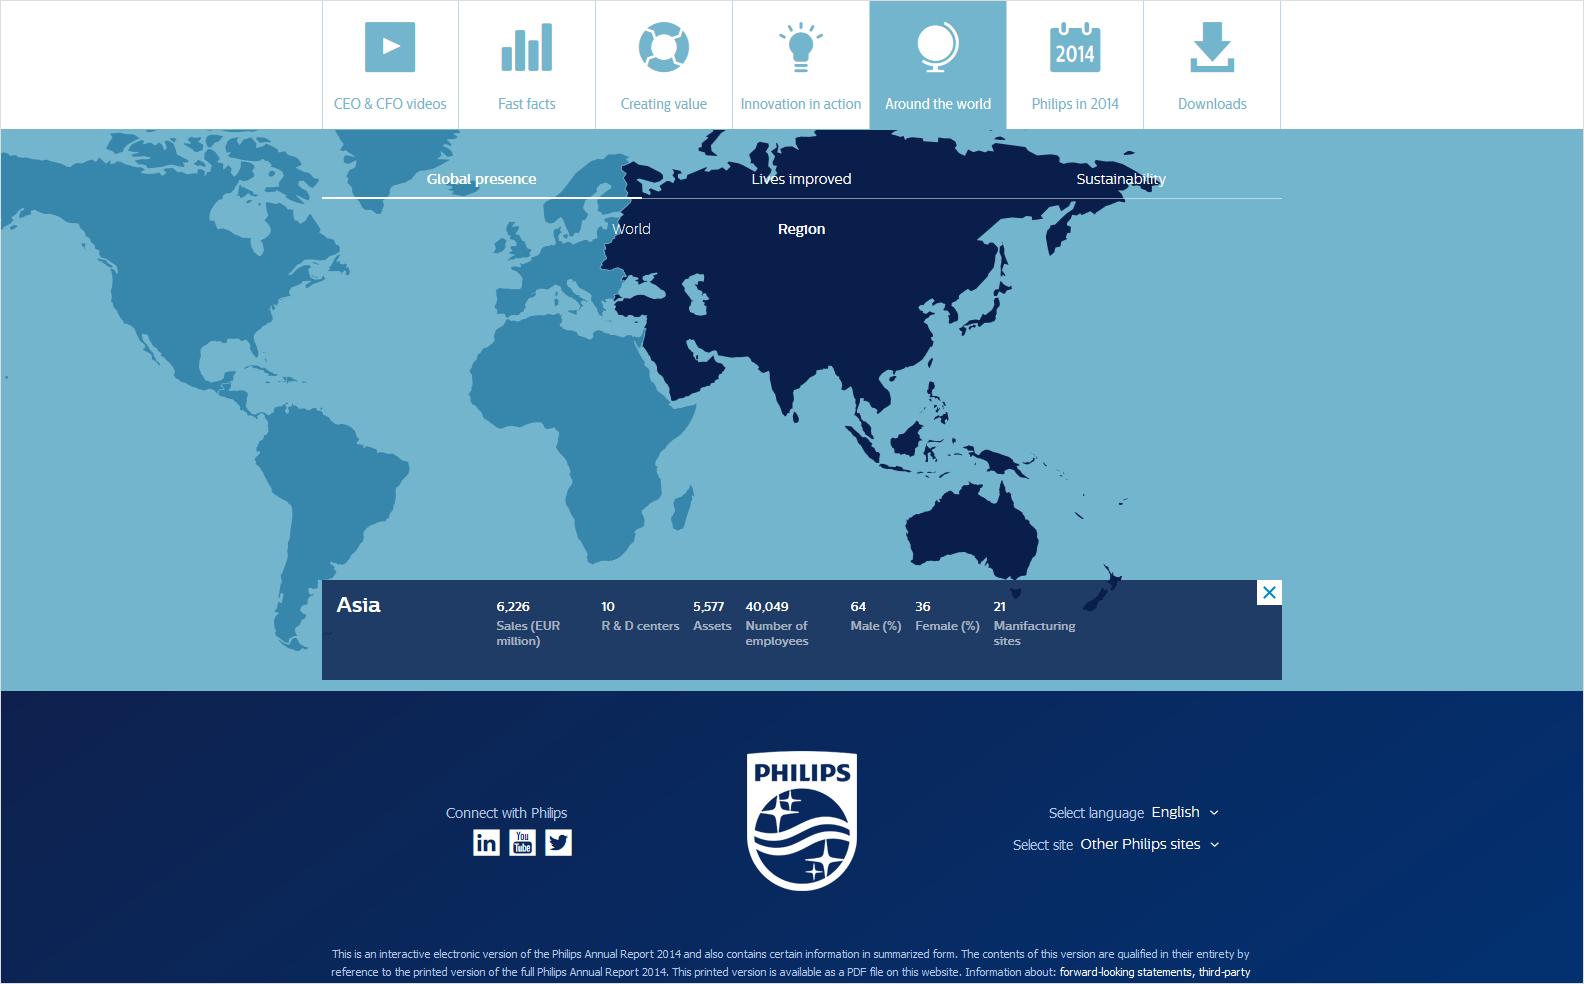 Philips Annual Report 2014